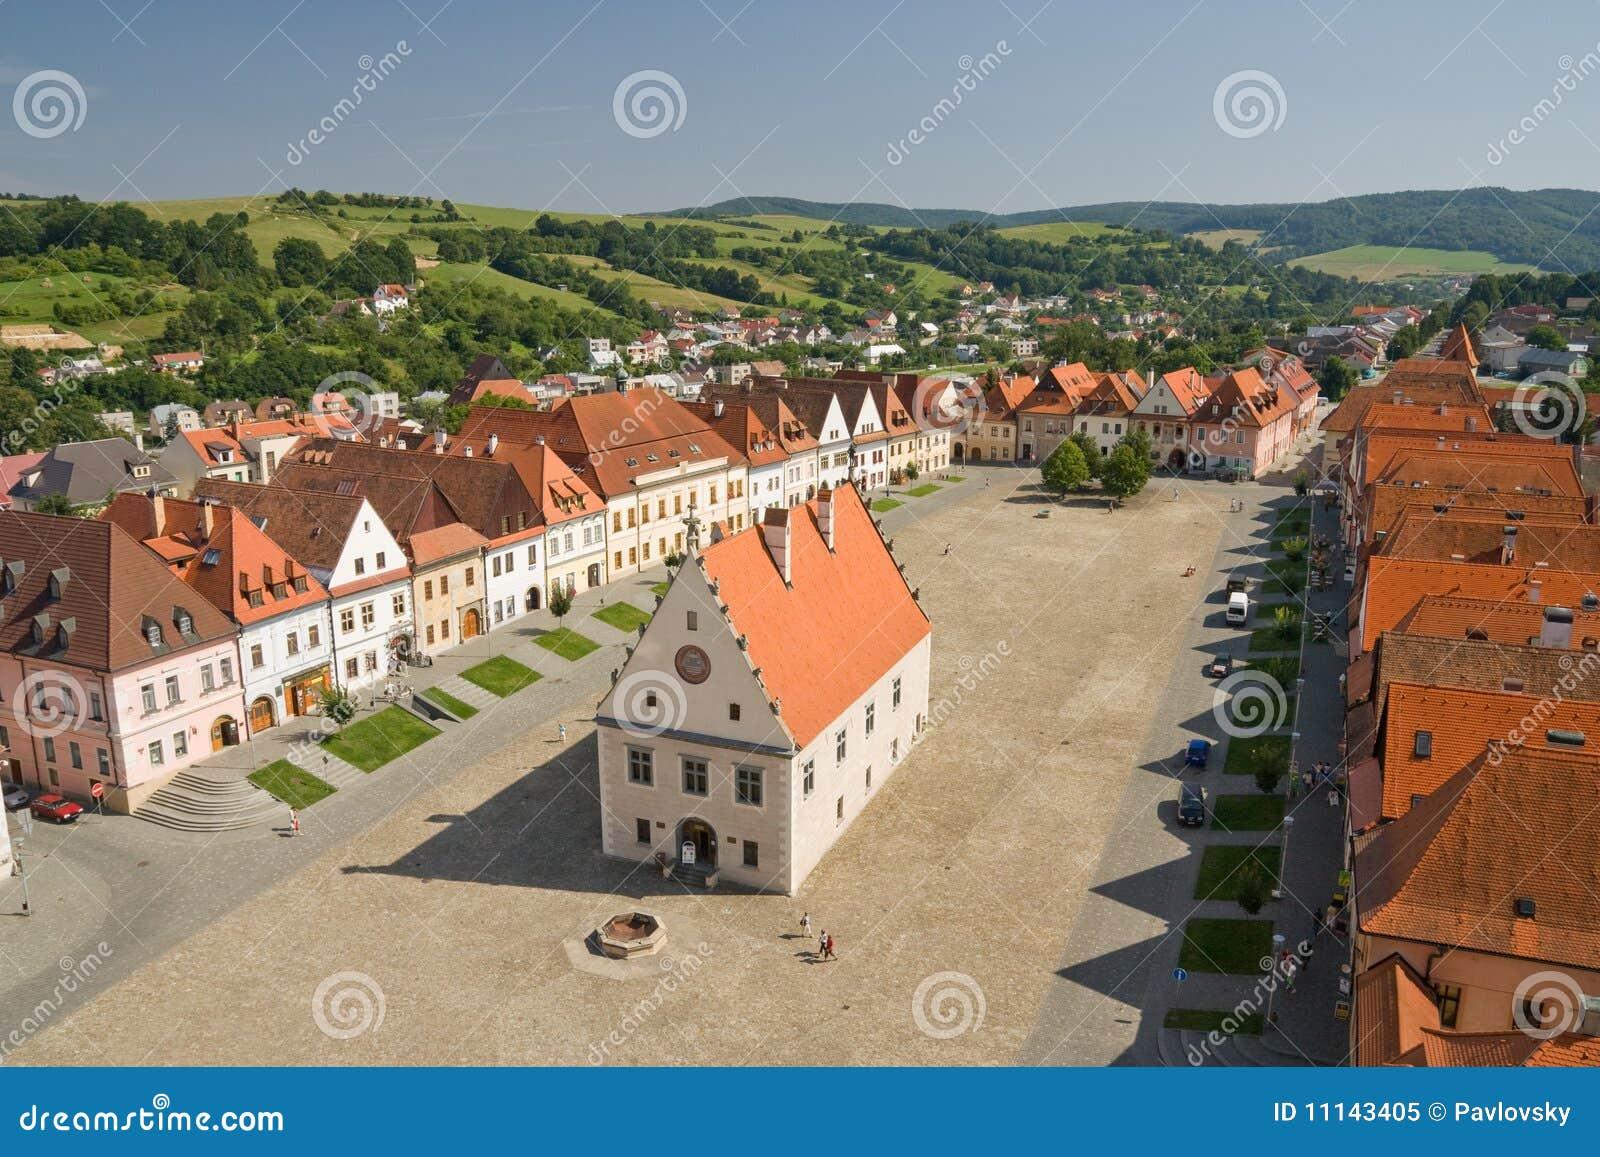 Bardejov - unesco town